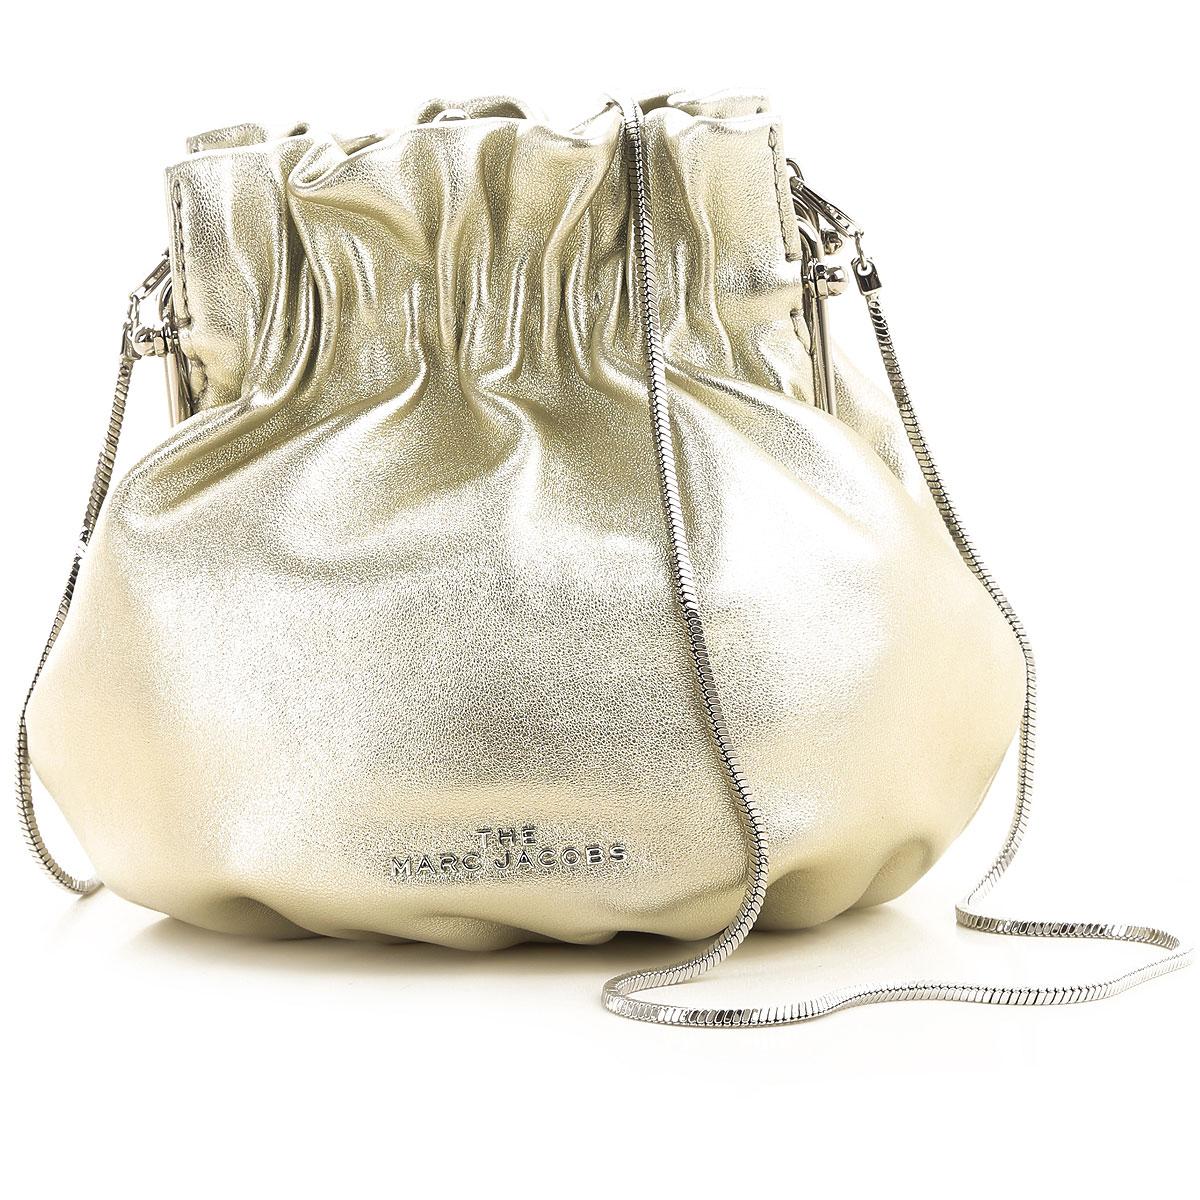 Marc Jacobs Clutch Bag On Sale, Platinum, Metallic Leather, 2019